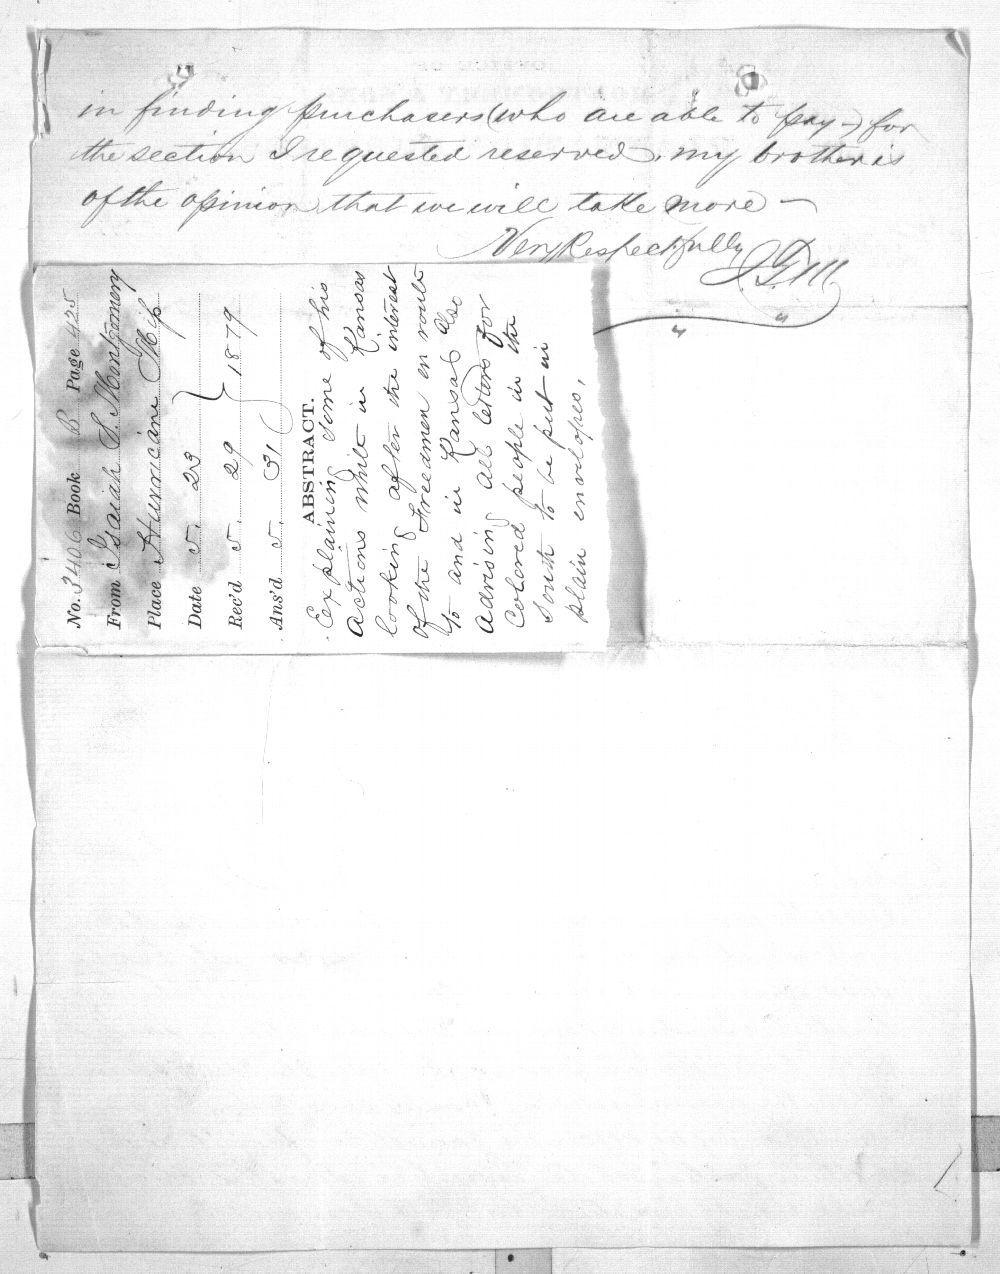 Isaiah T. Montgomery to Governor John P. St. John - 6